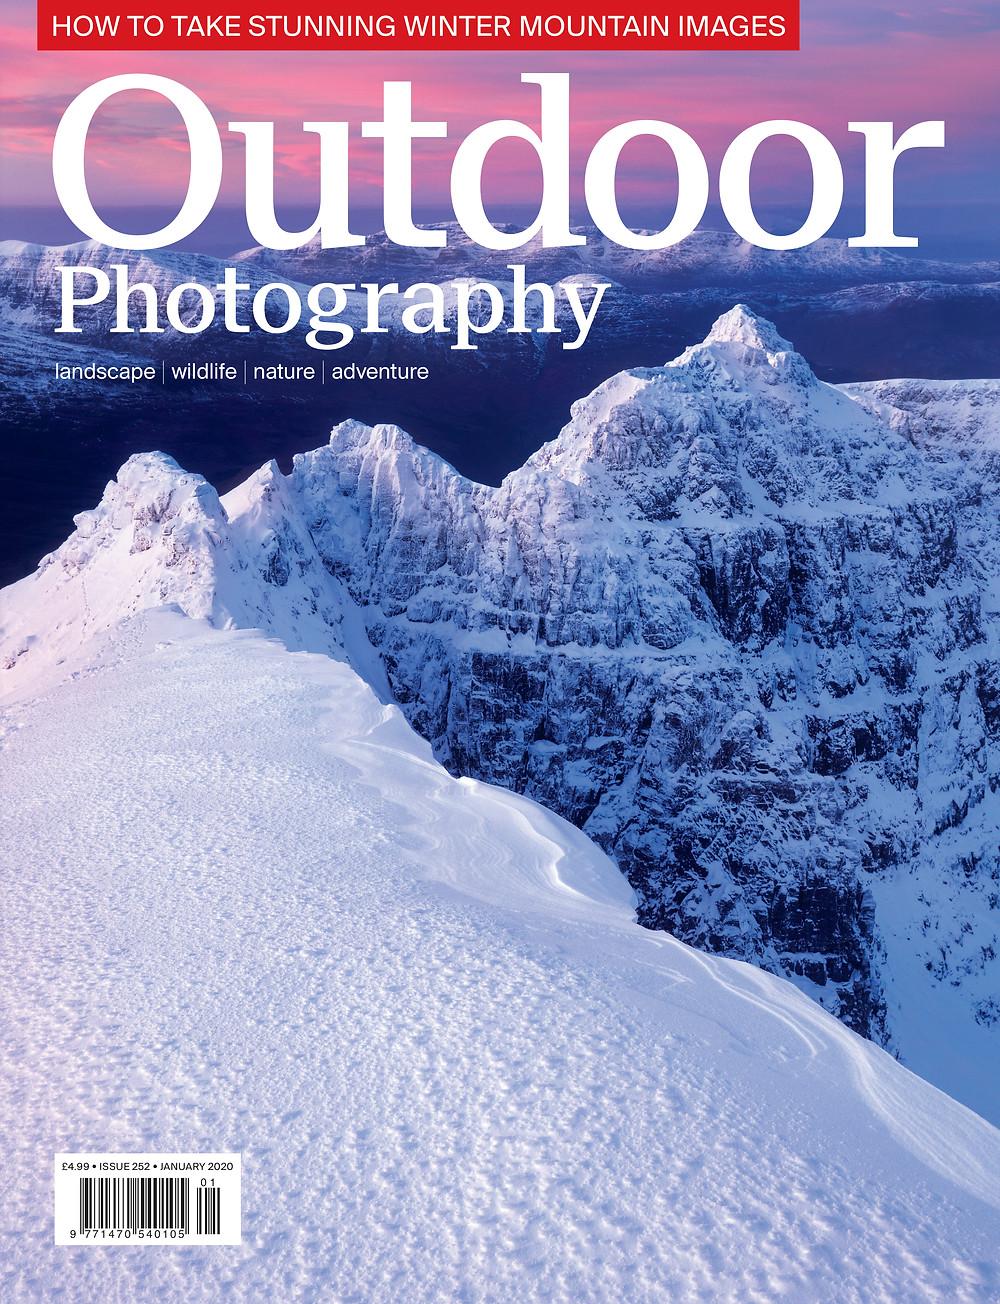 landscape photography, daniel wretham